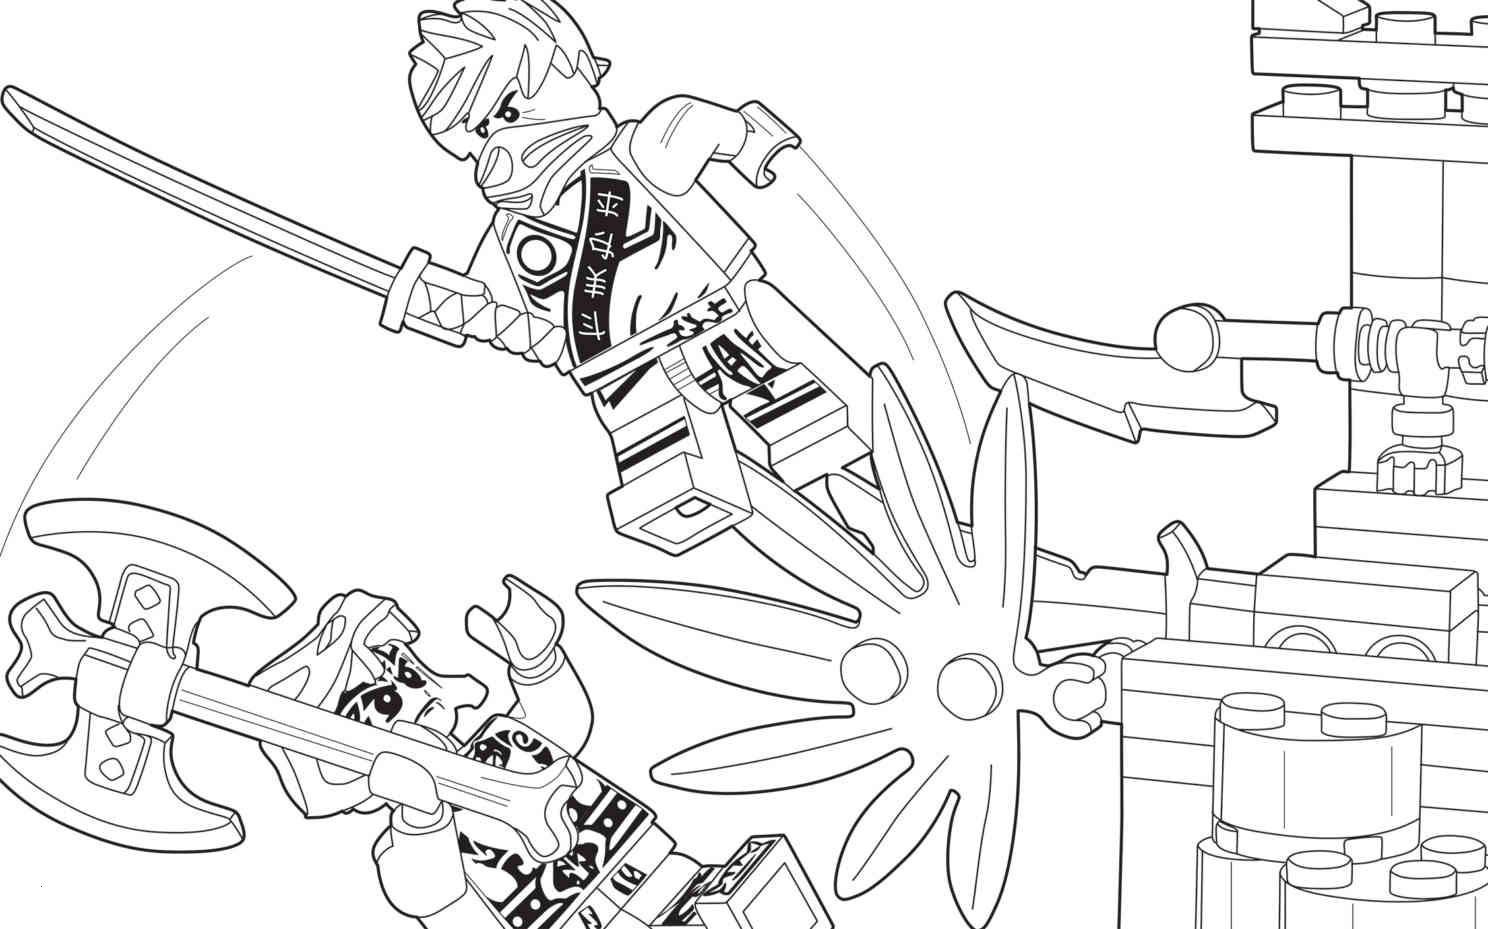 Ninjago Zane Ausmalbilder Einzigartig 32 Lego Ninjago Lloyd Ausmalbilder forstergallery Bild